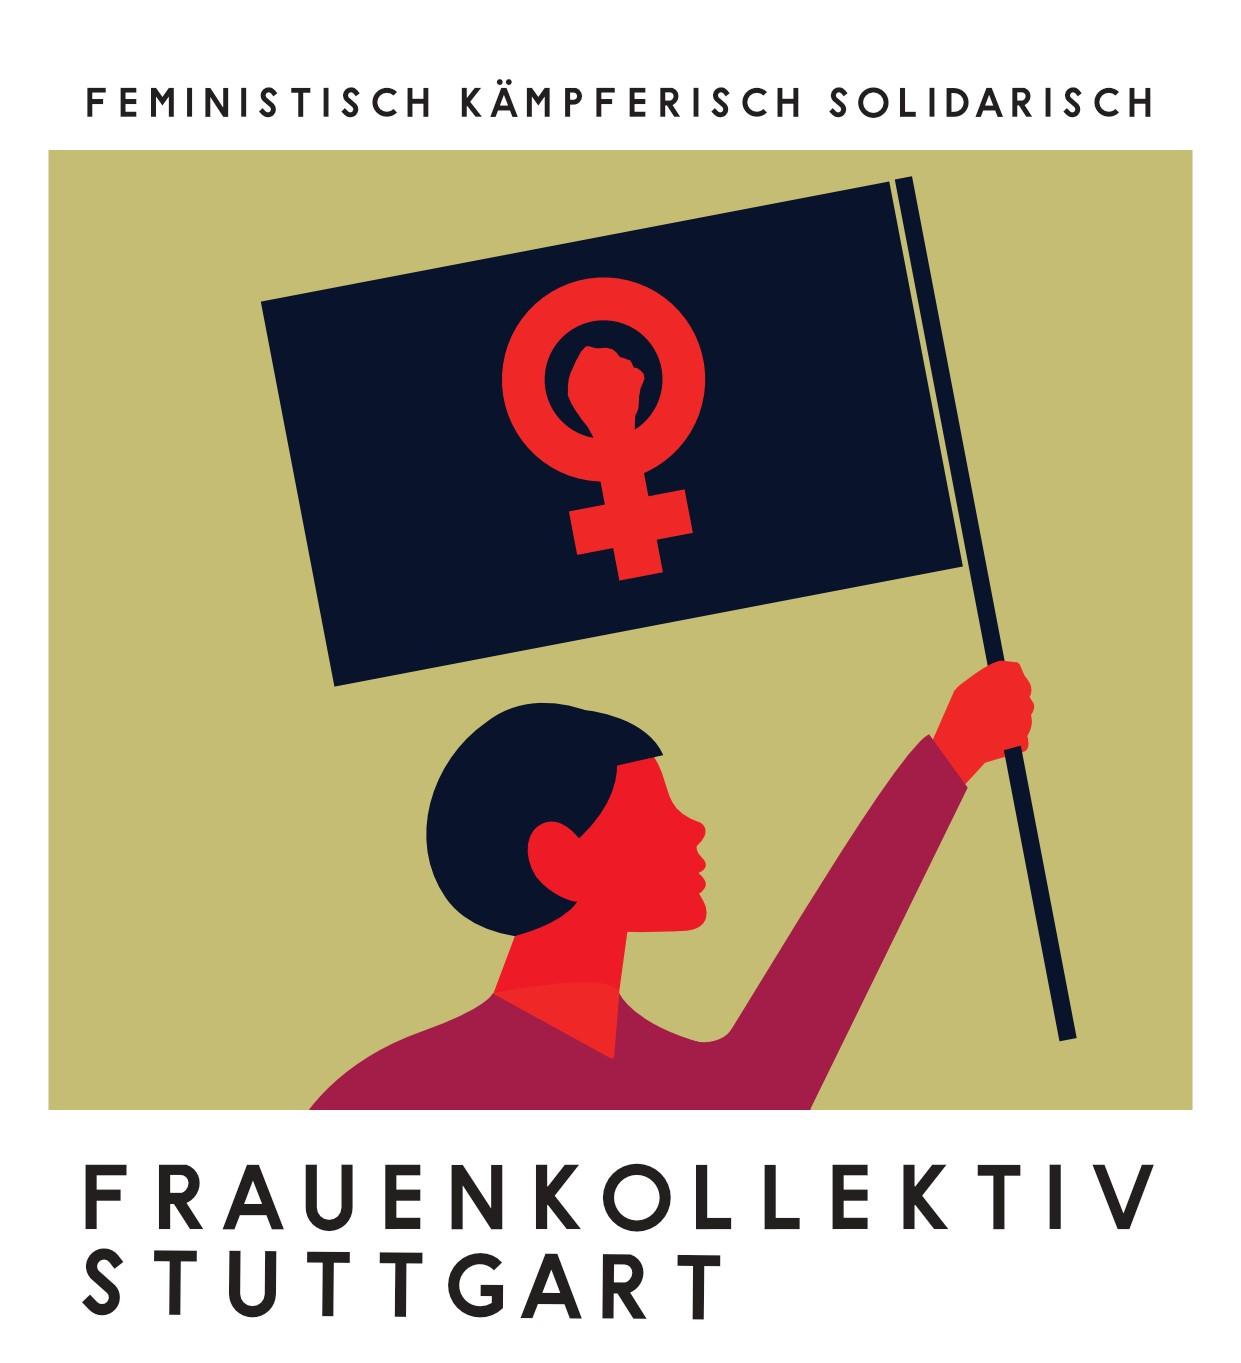 Frauenkollektiv Stuttgart